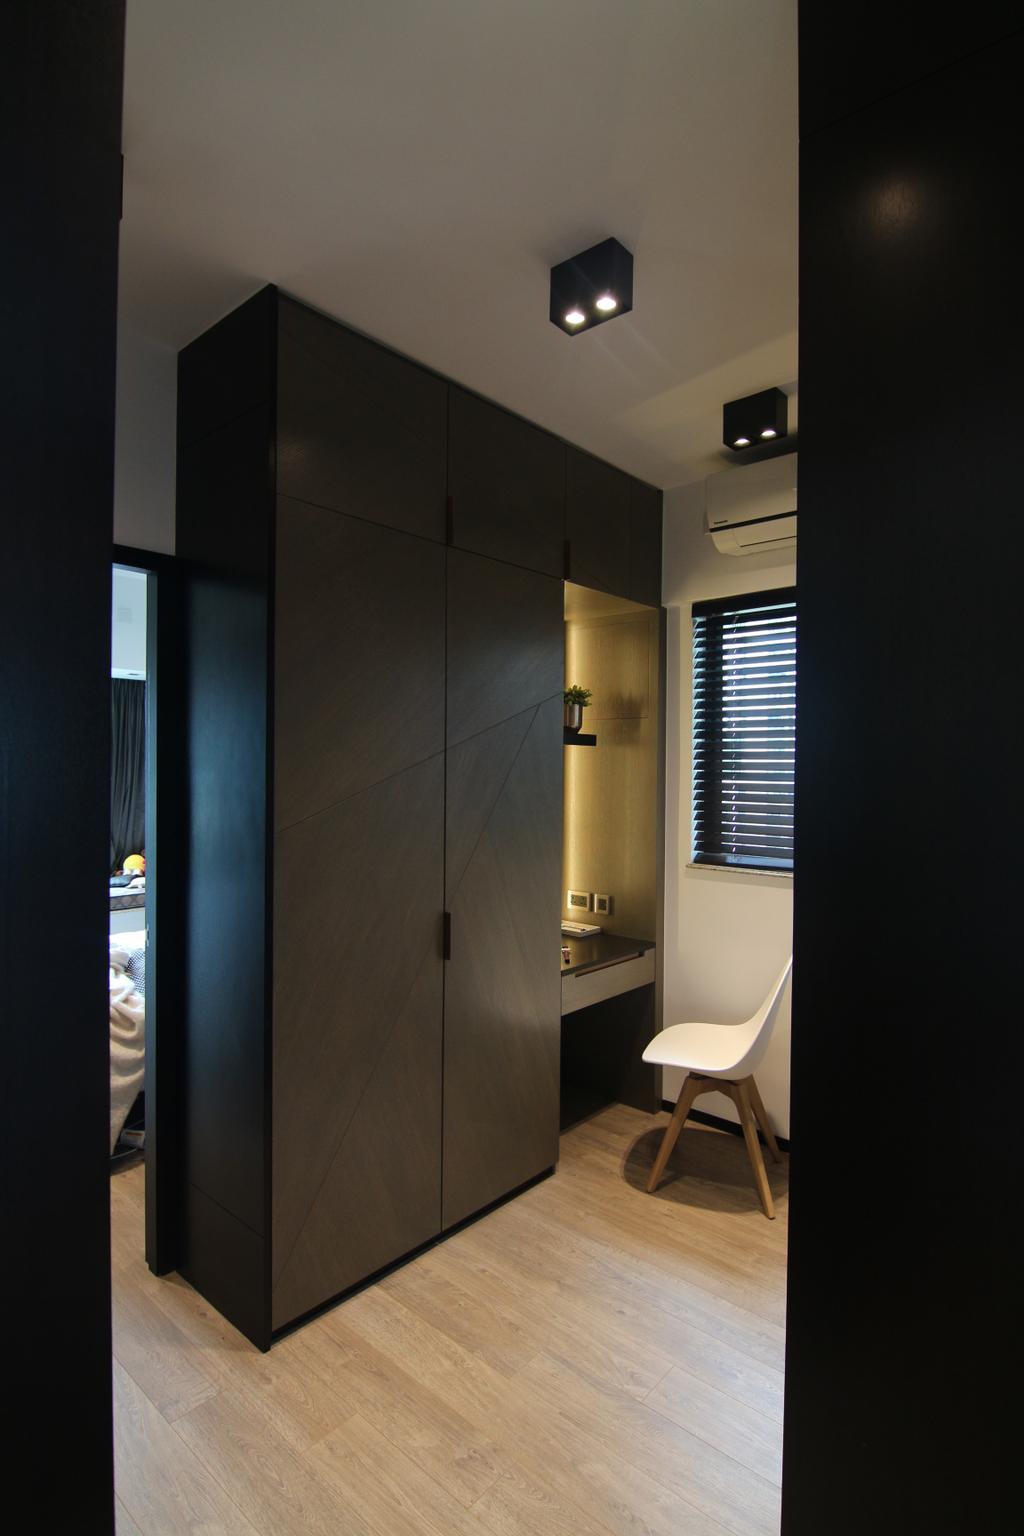 私家樓, 書房, 珀麗灣, 室內設計師, Bel Concetto